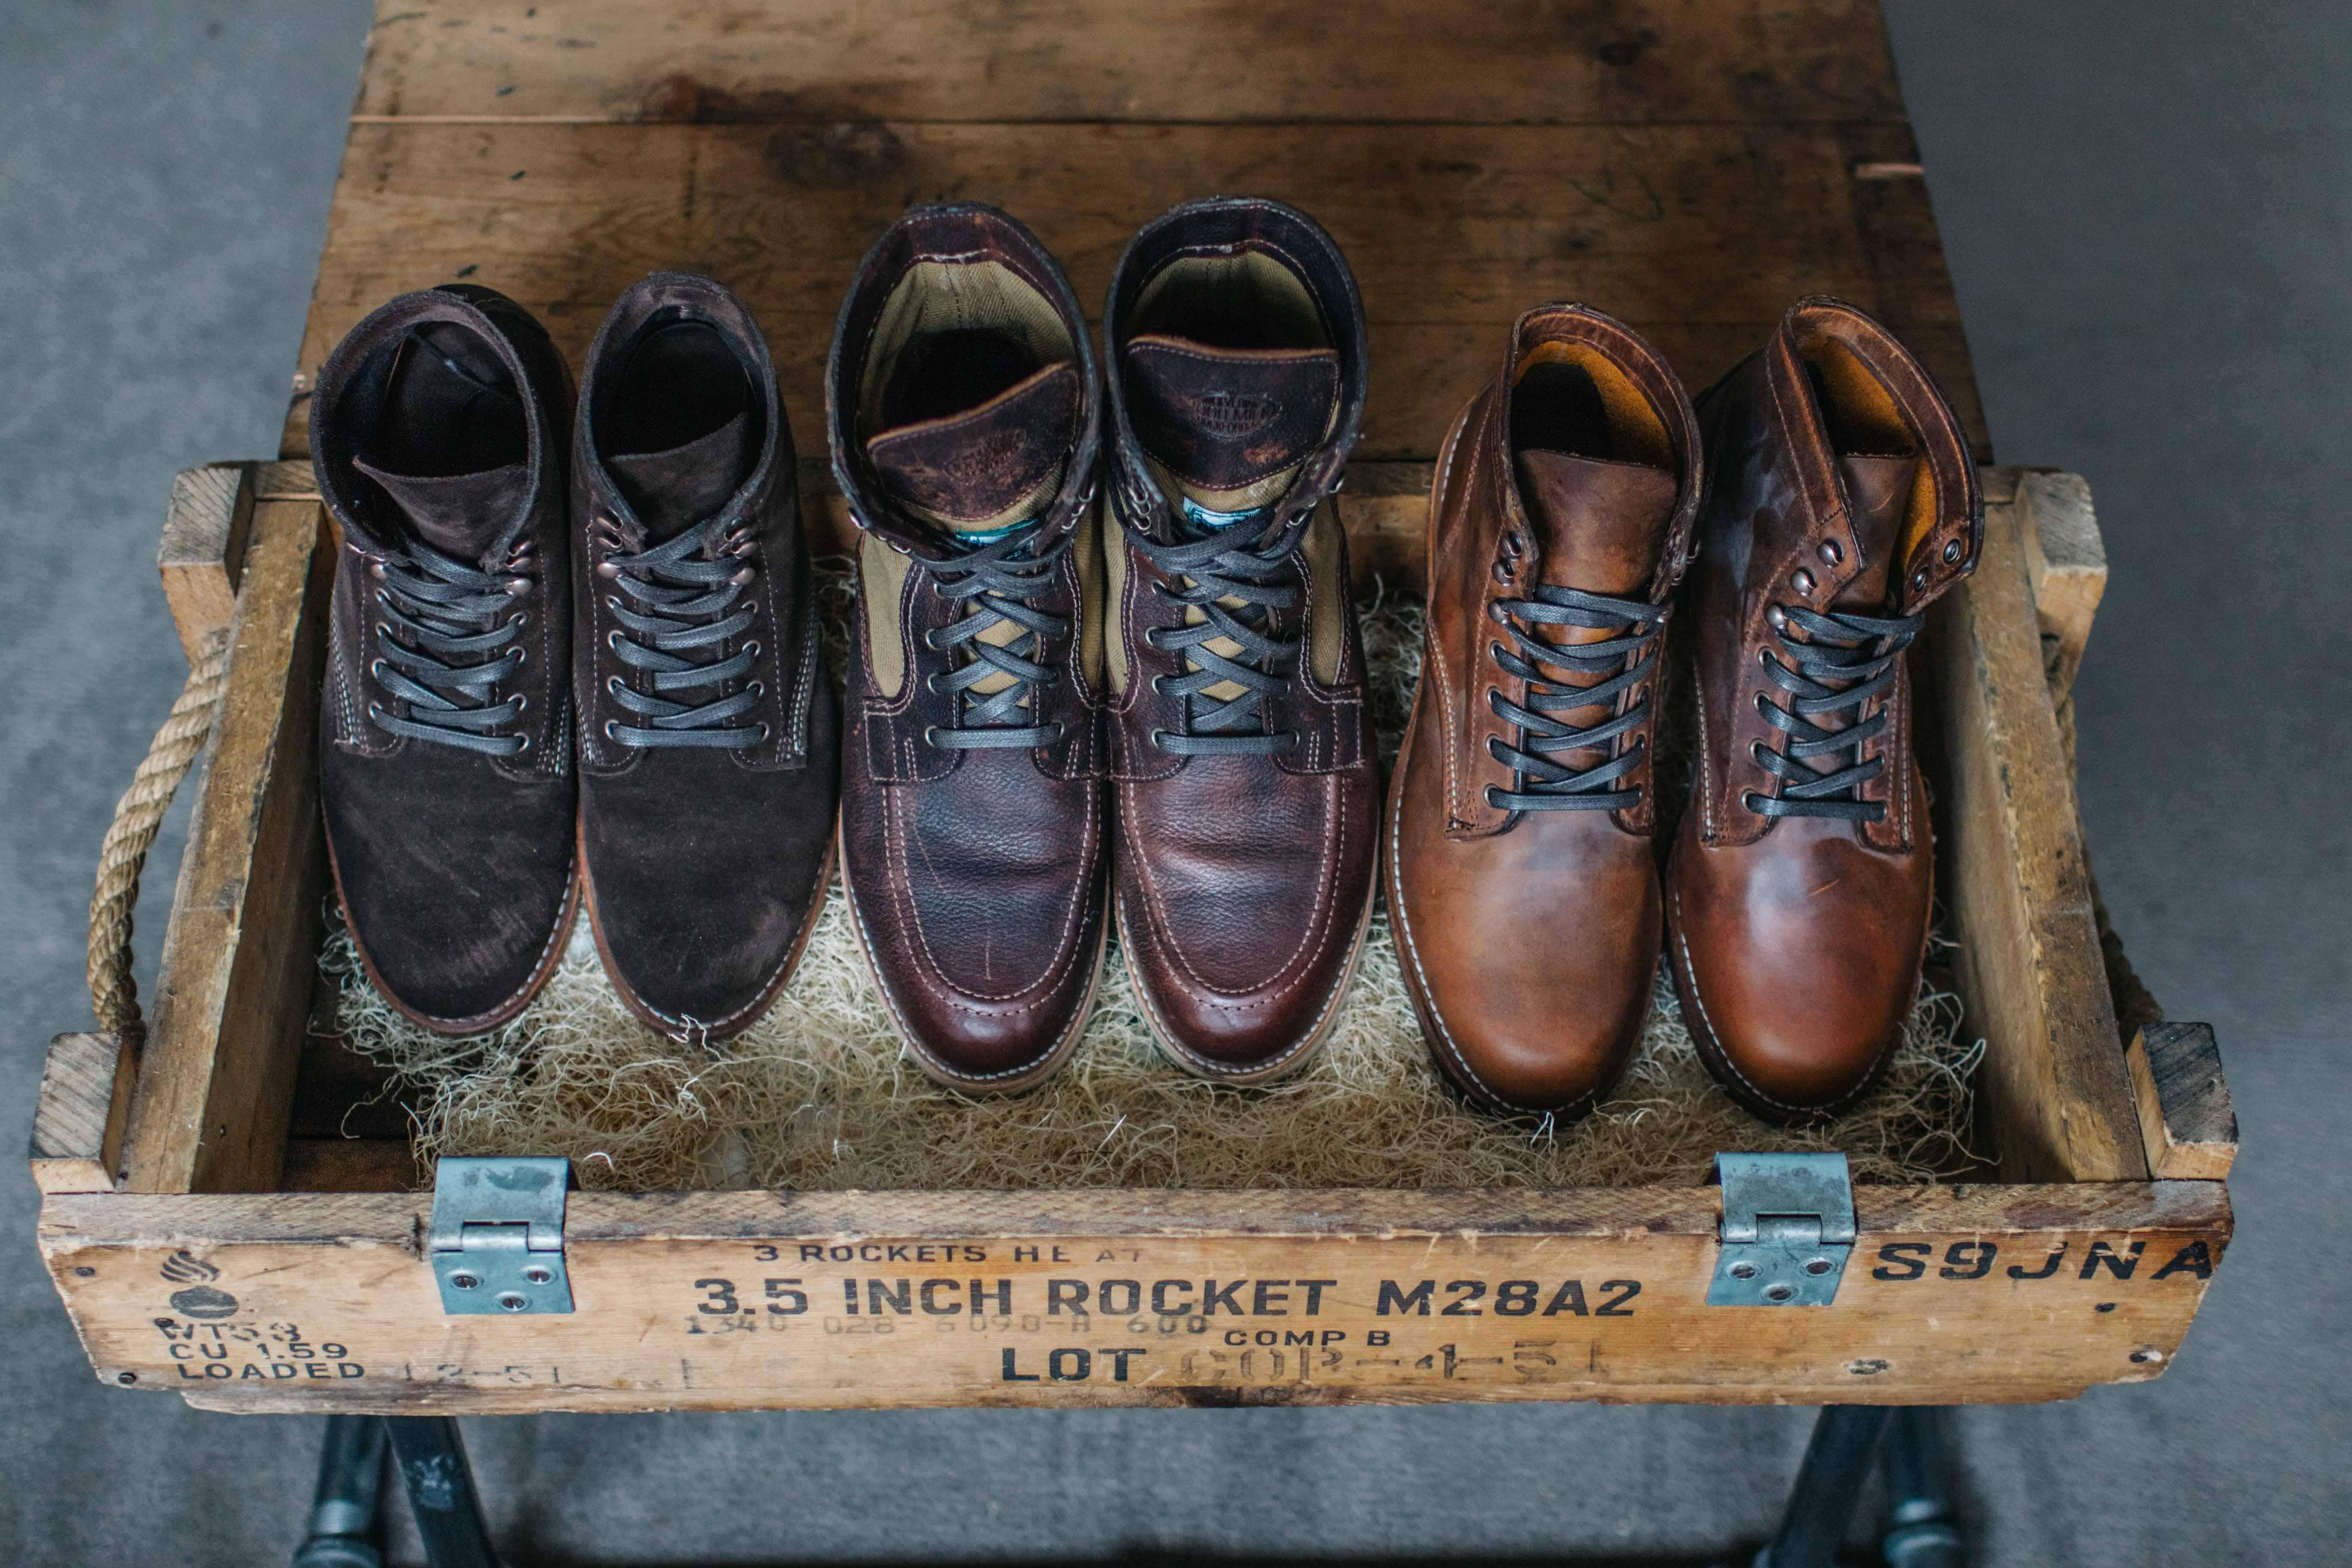 38e35eac7d1 Wolverine 1000 Mile Boots - Sideroist